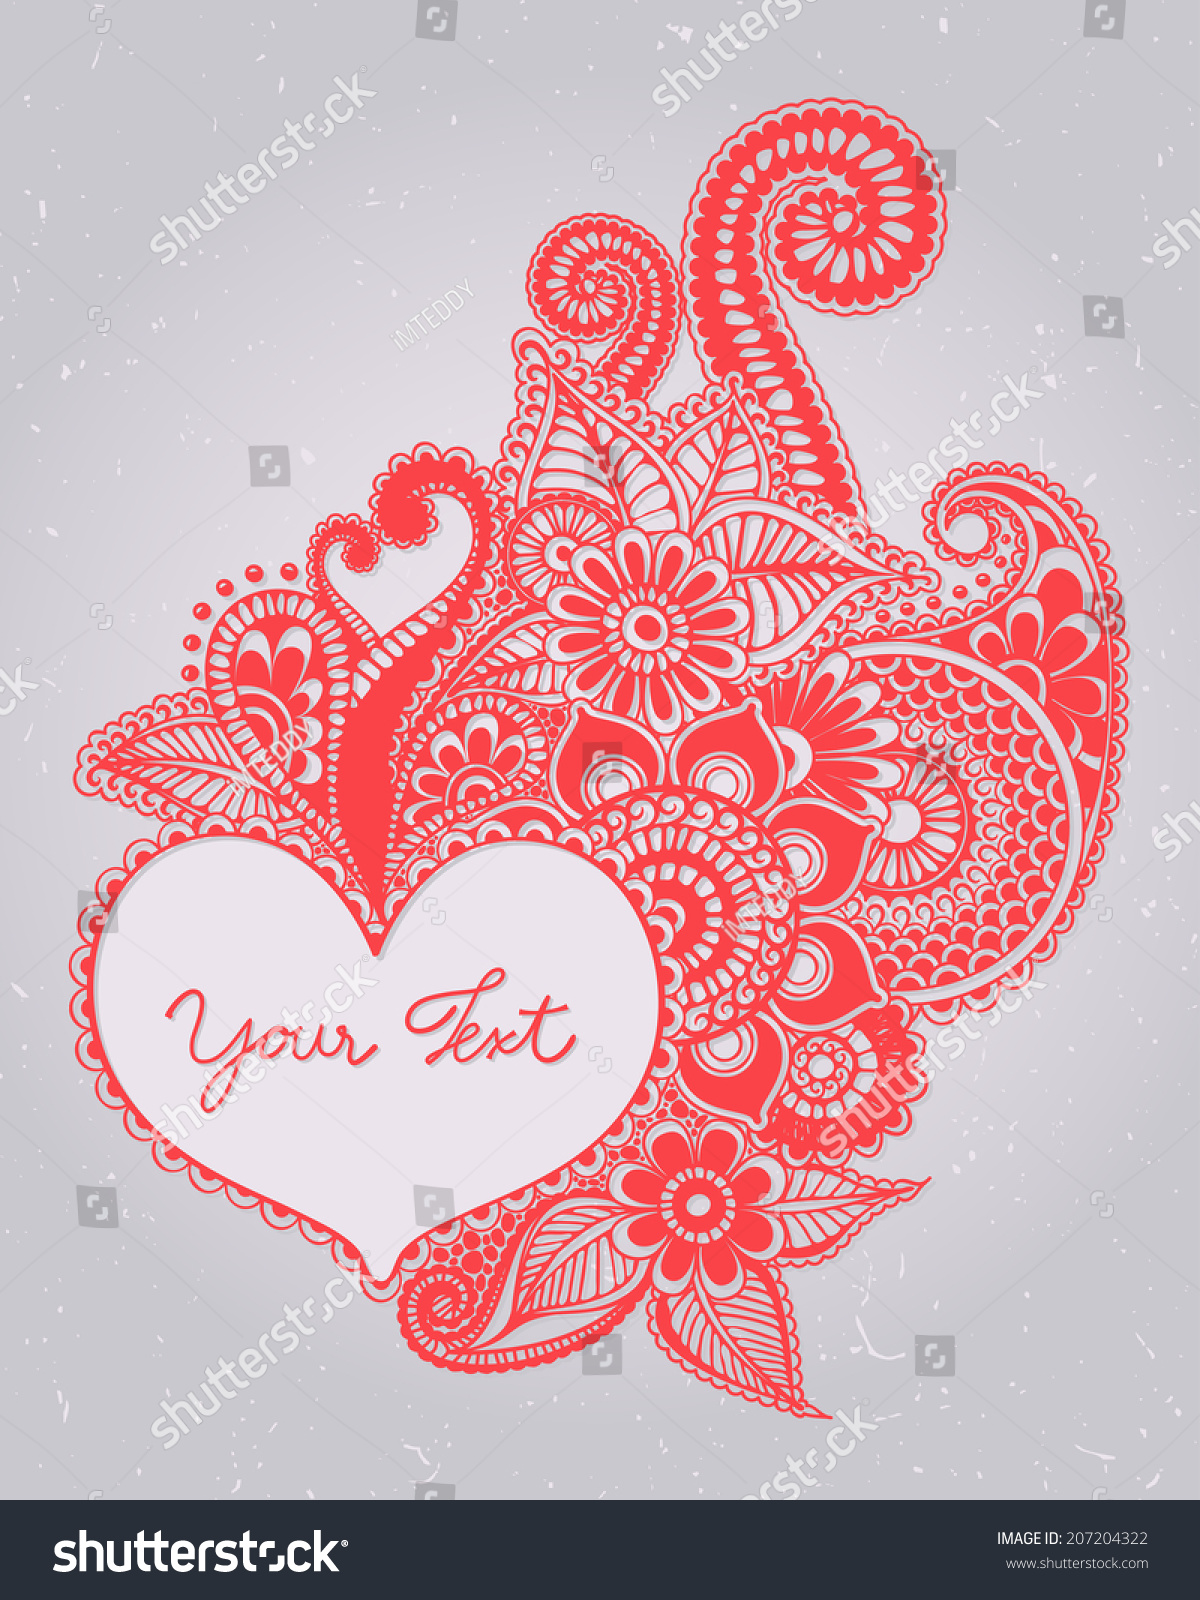 Heart Henna Mehndi Valentines Day Doodles Stock Vector (Royalty Free ...